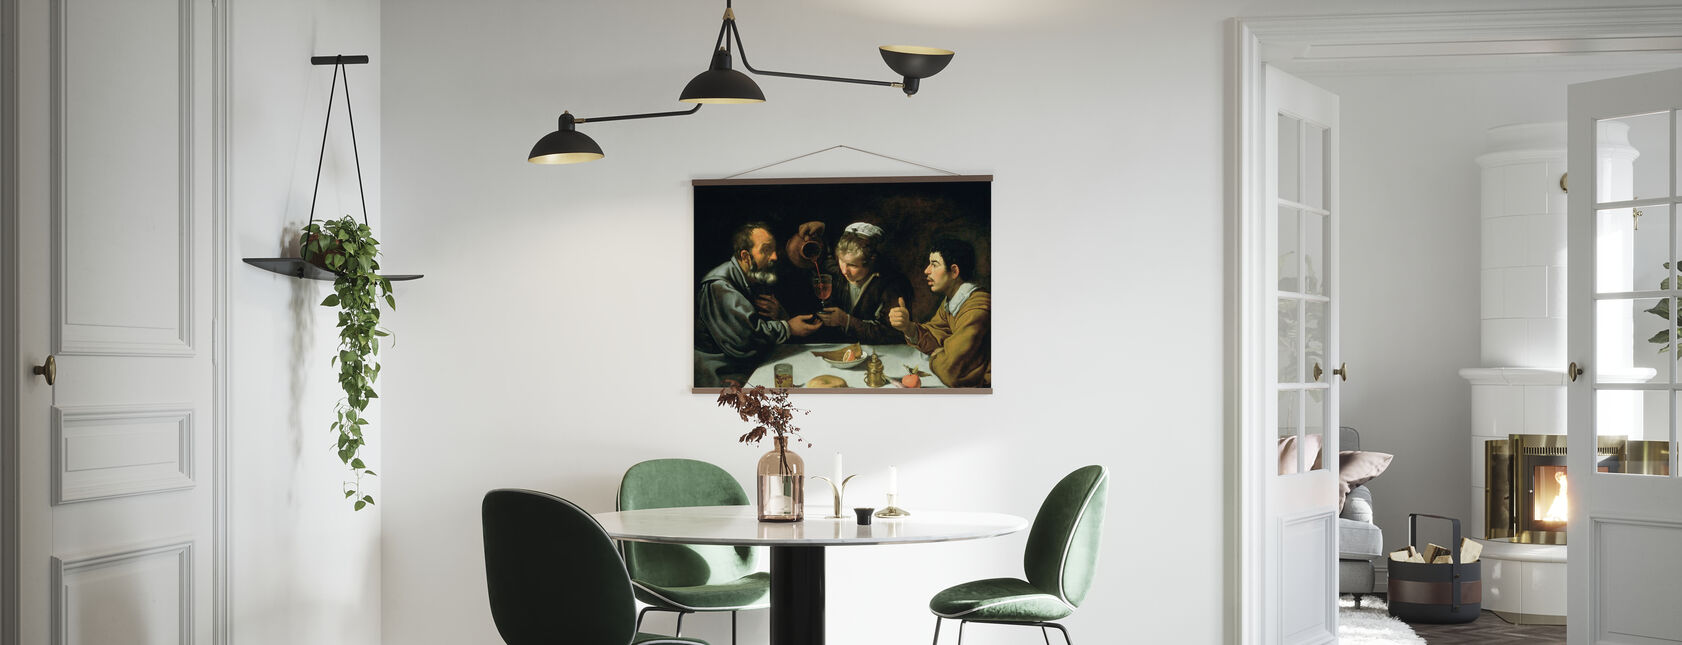 Lunch - Diego Velasquez - Poster - Keuken